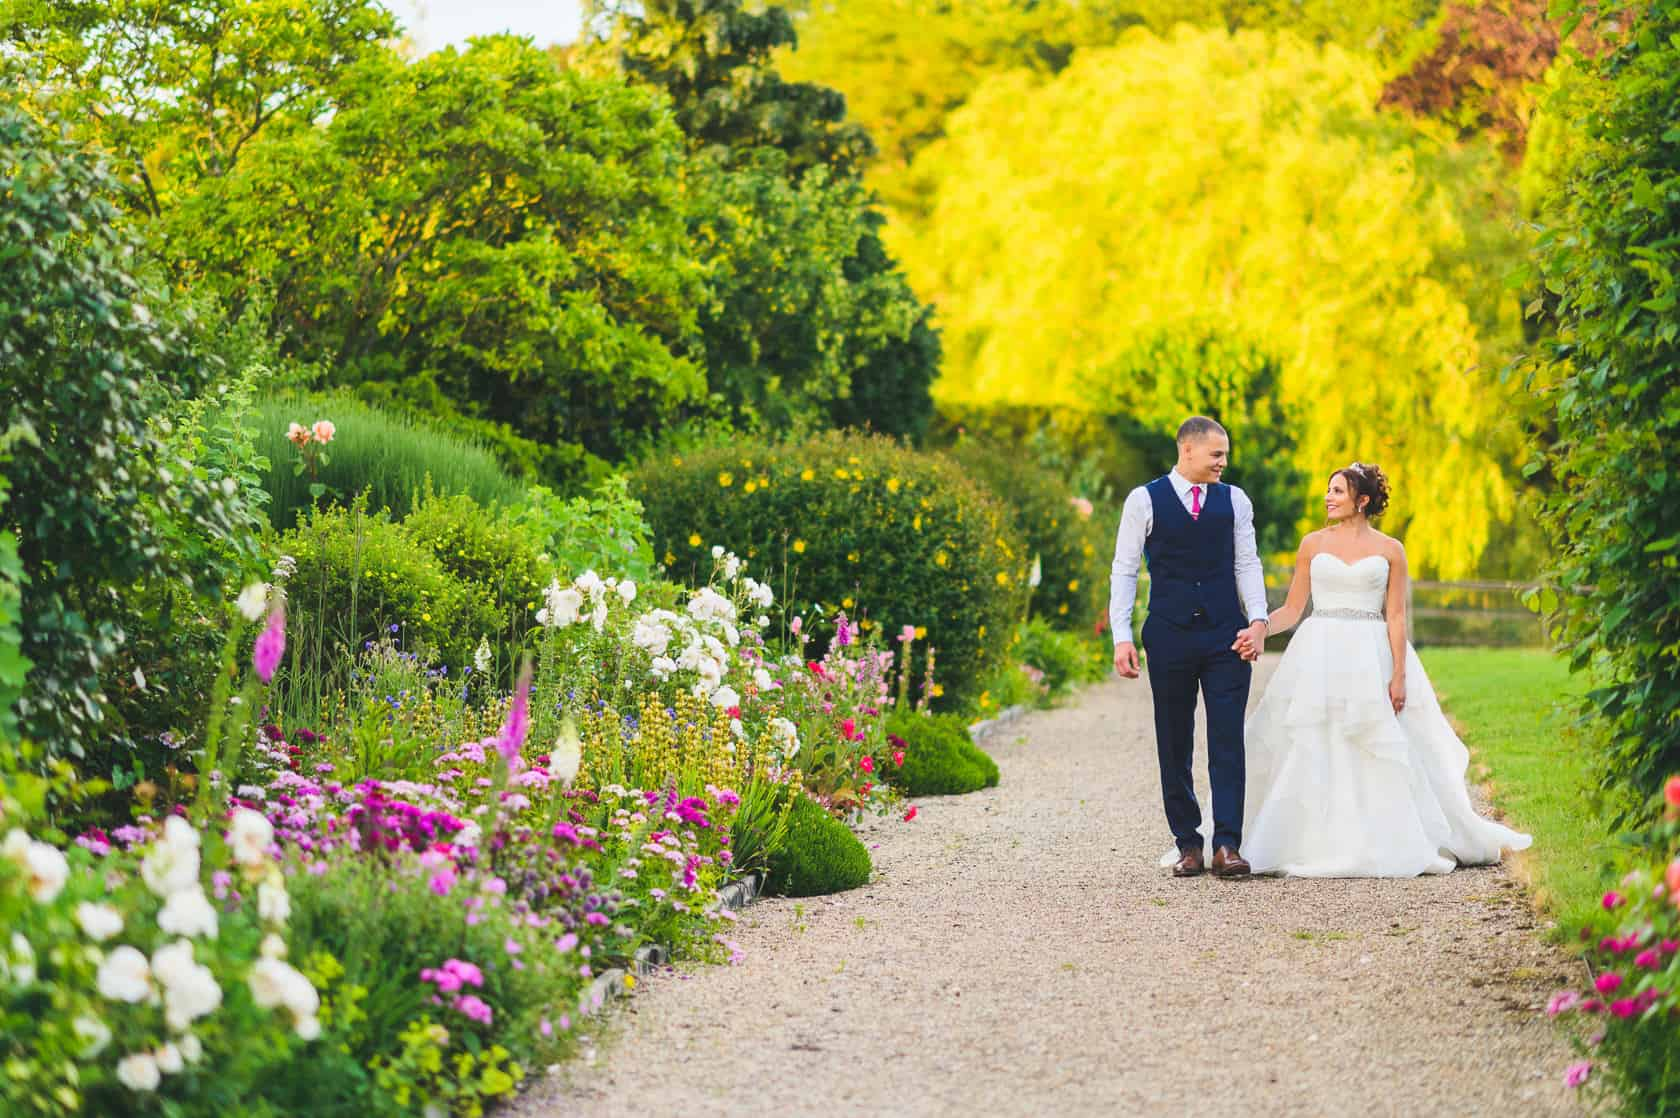 Best_Wedding_Photography_2019_Wedding-Photographer-Essex_019